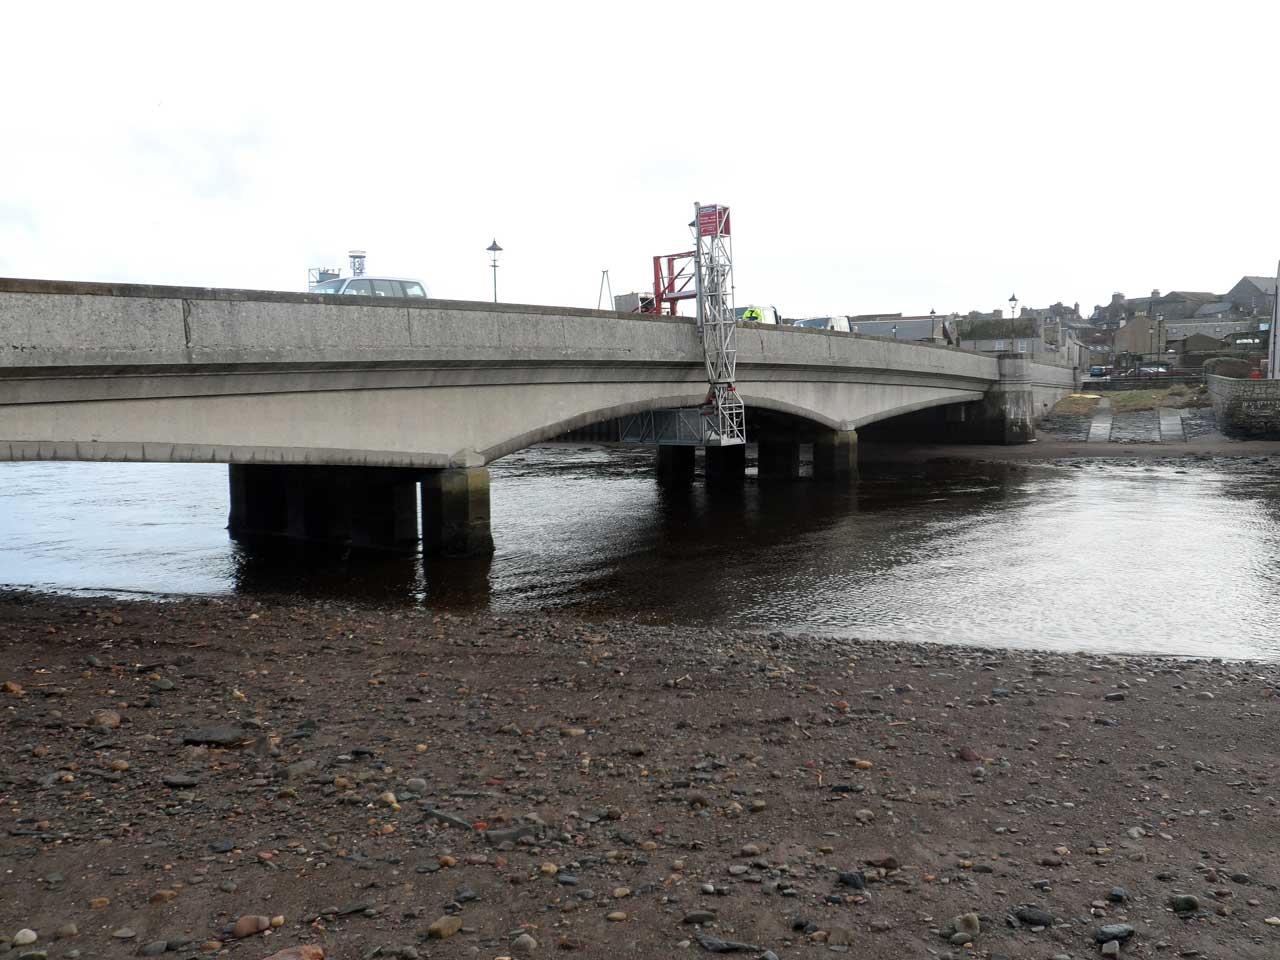 Photo: Repairing Pipes Under Service Bridge, Wick